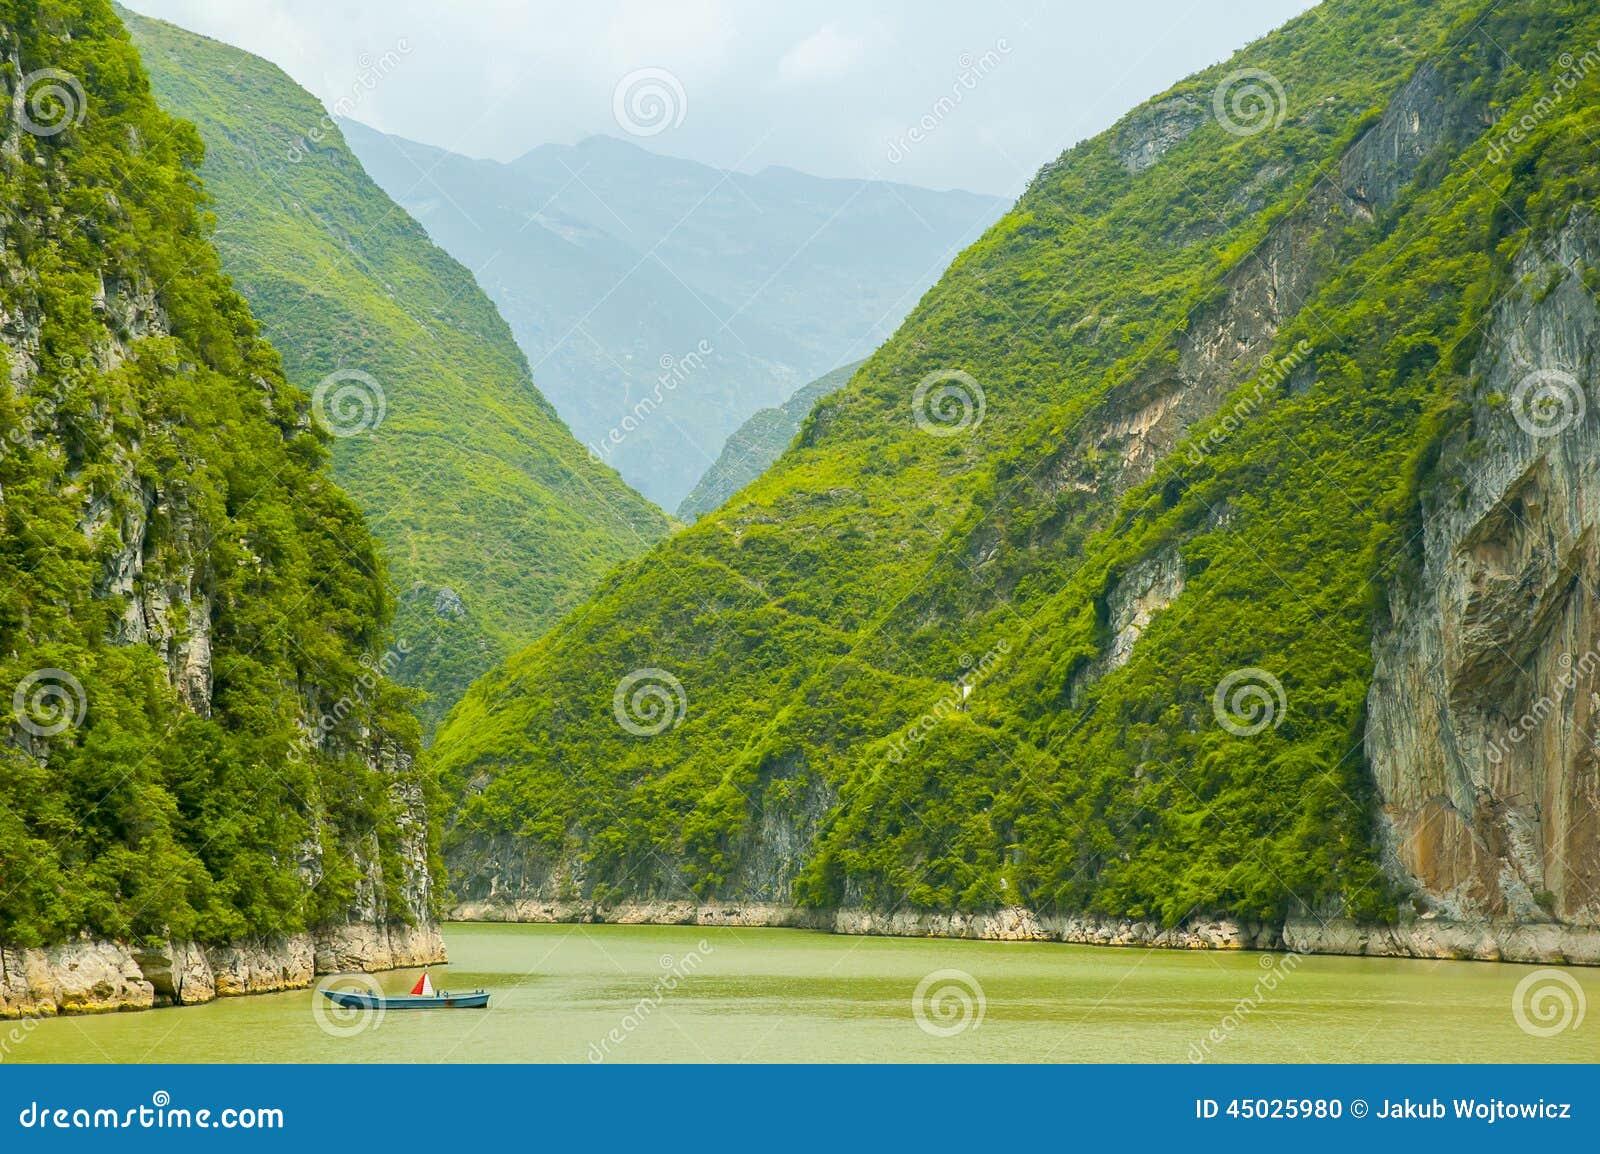 Three Gorges Yangtze River